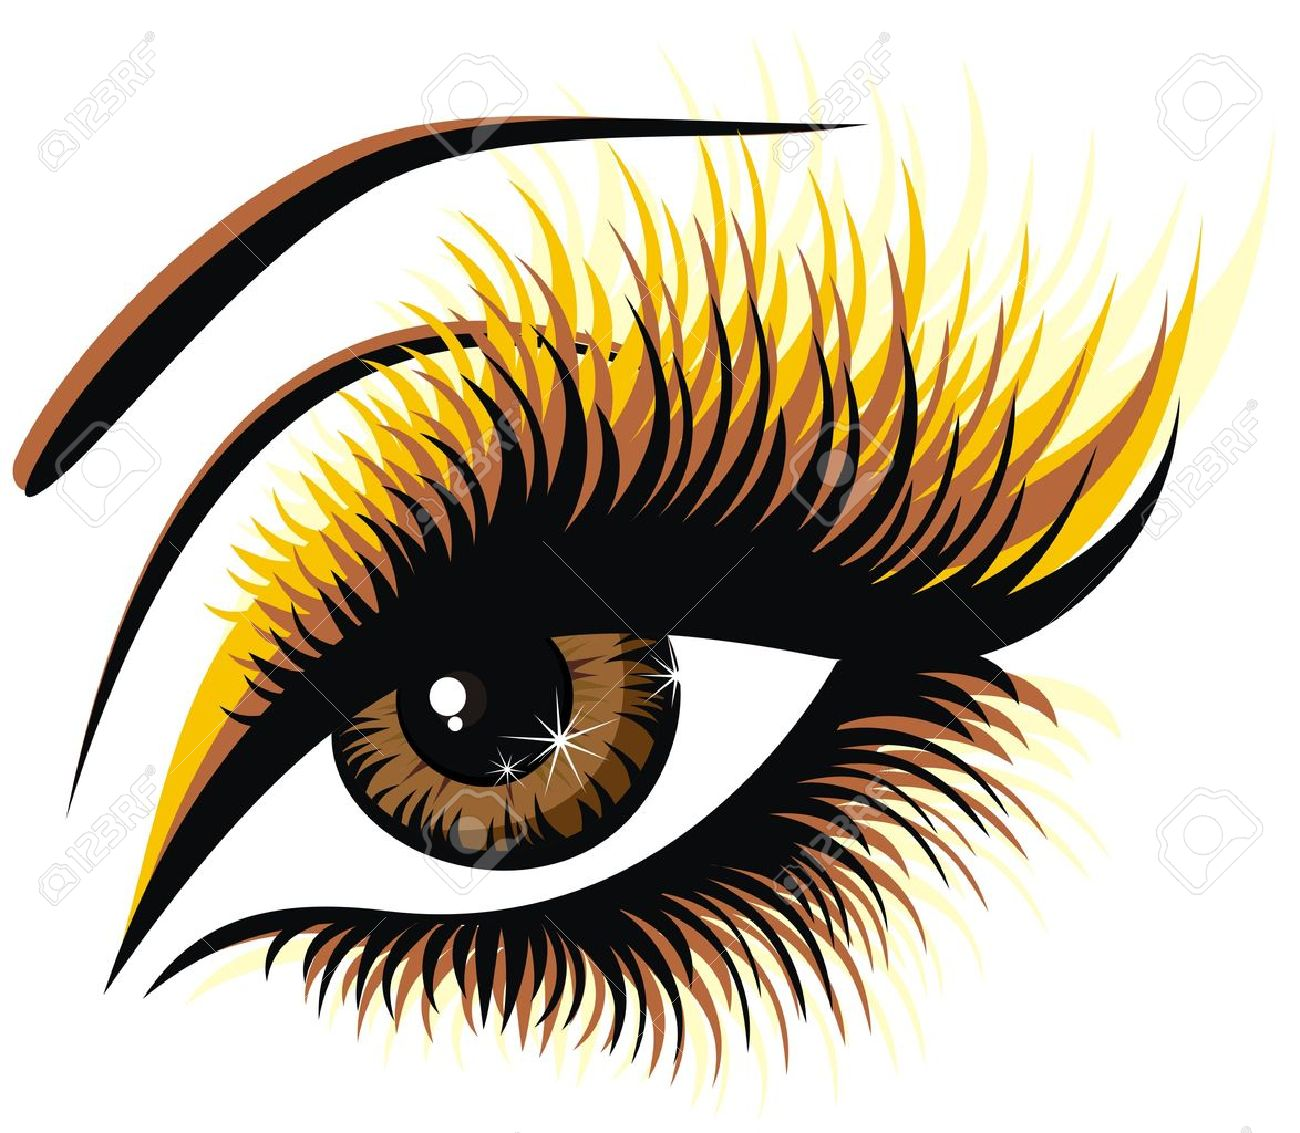 10,474 Eyelash Stock Vector Illustration And Royalty Free Eyelash.